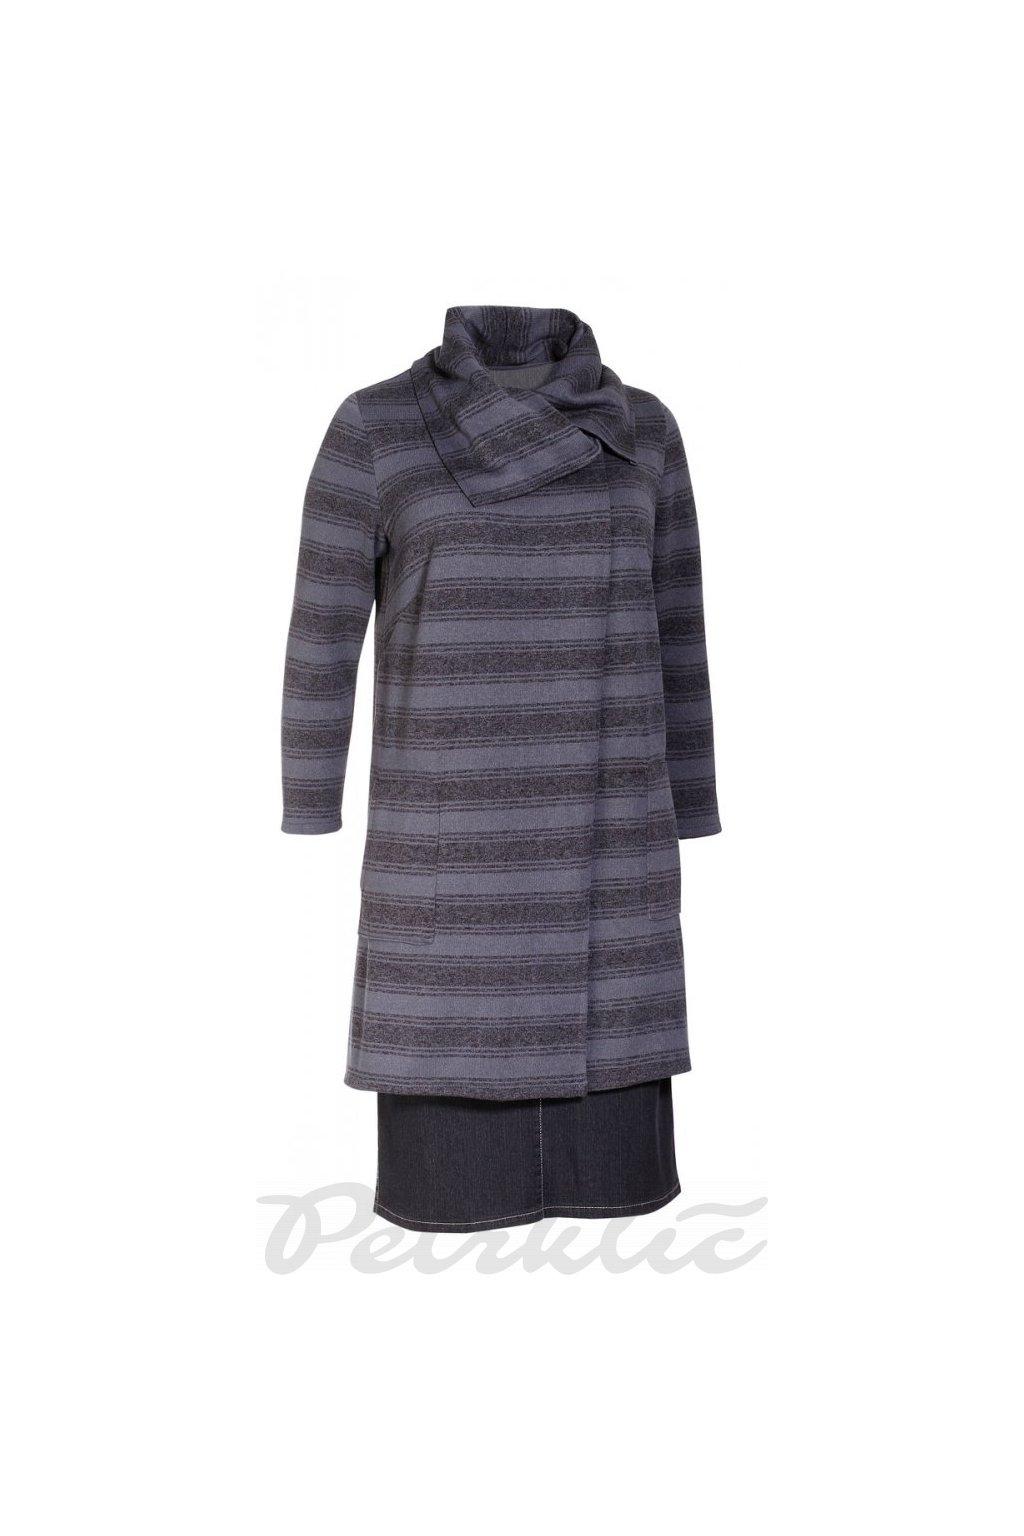 FELINA úpletový kabátek 96 cm